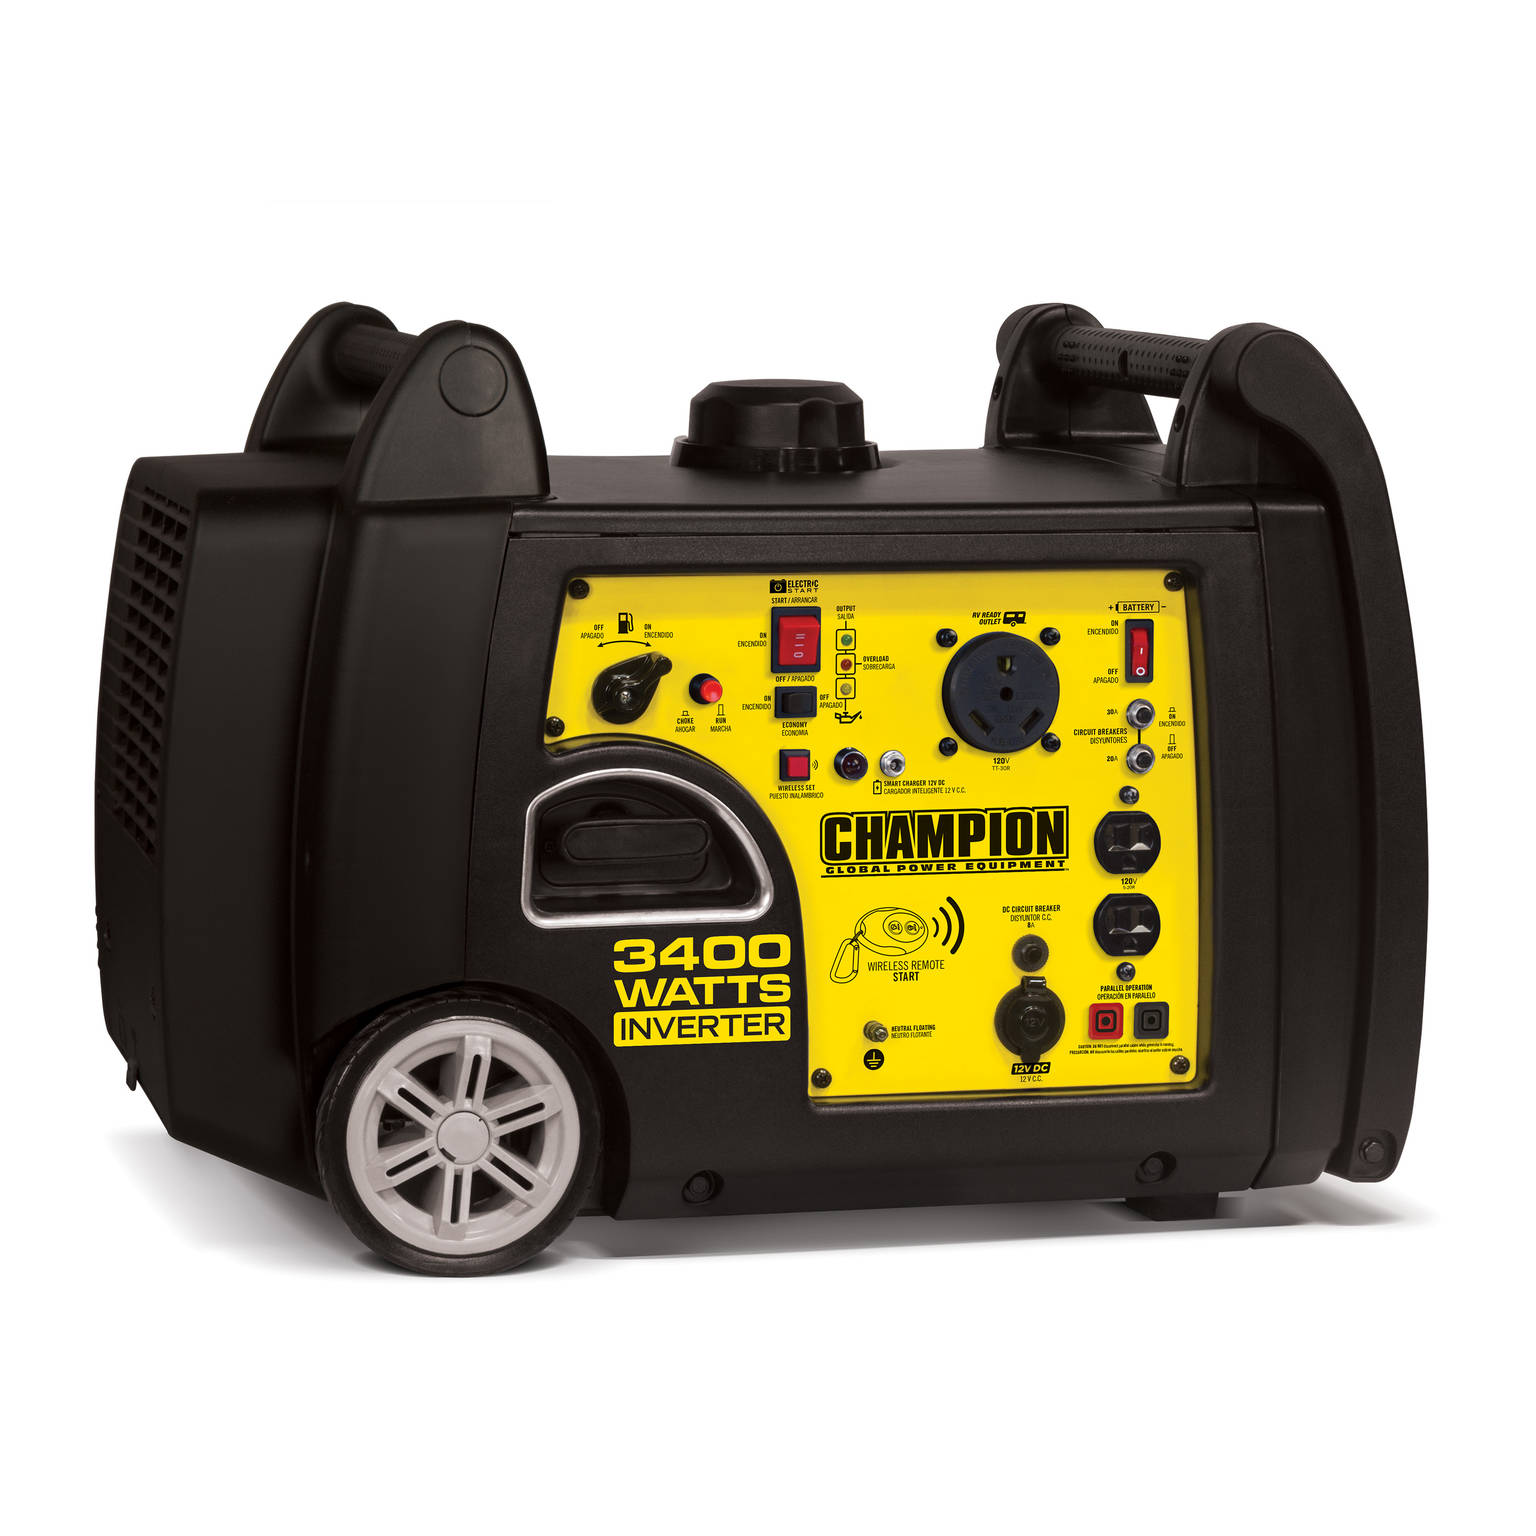 Champion 3400-Watt RV Ready Portable Inverter Generator with Wireless Remote Start